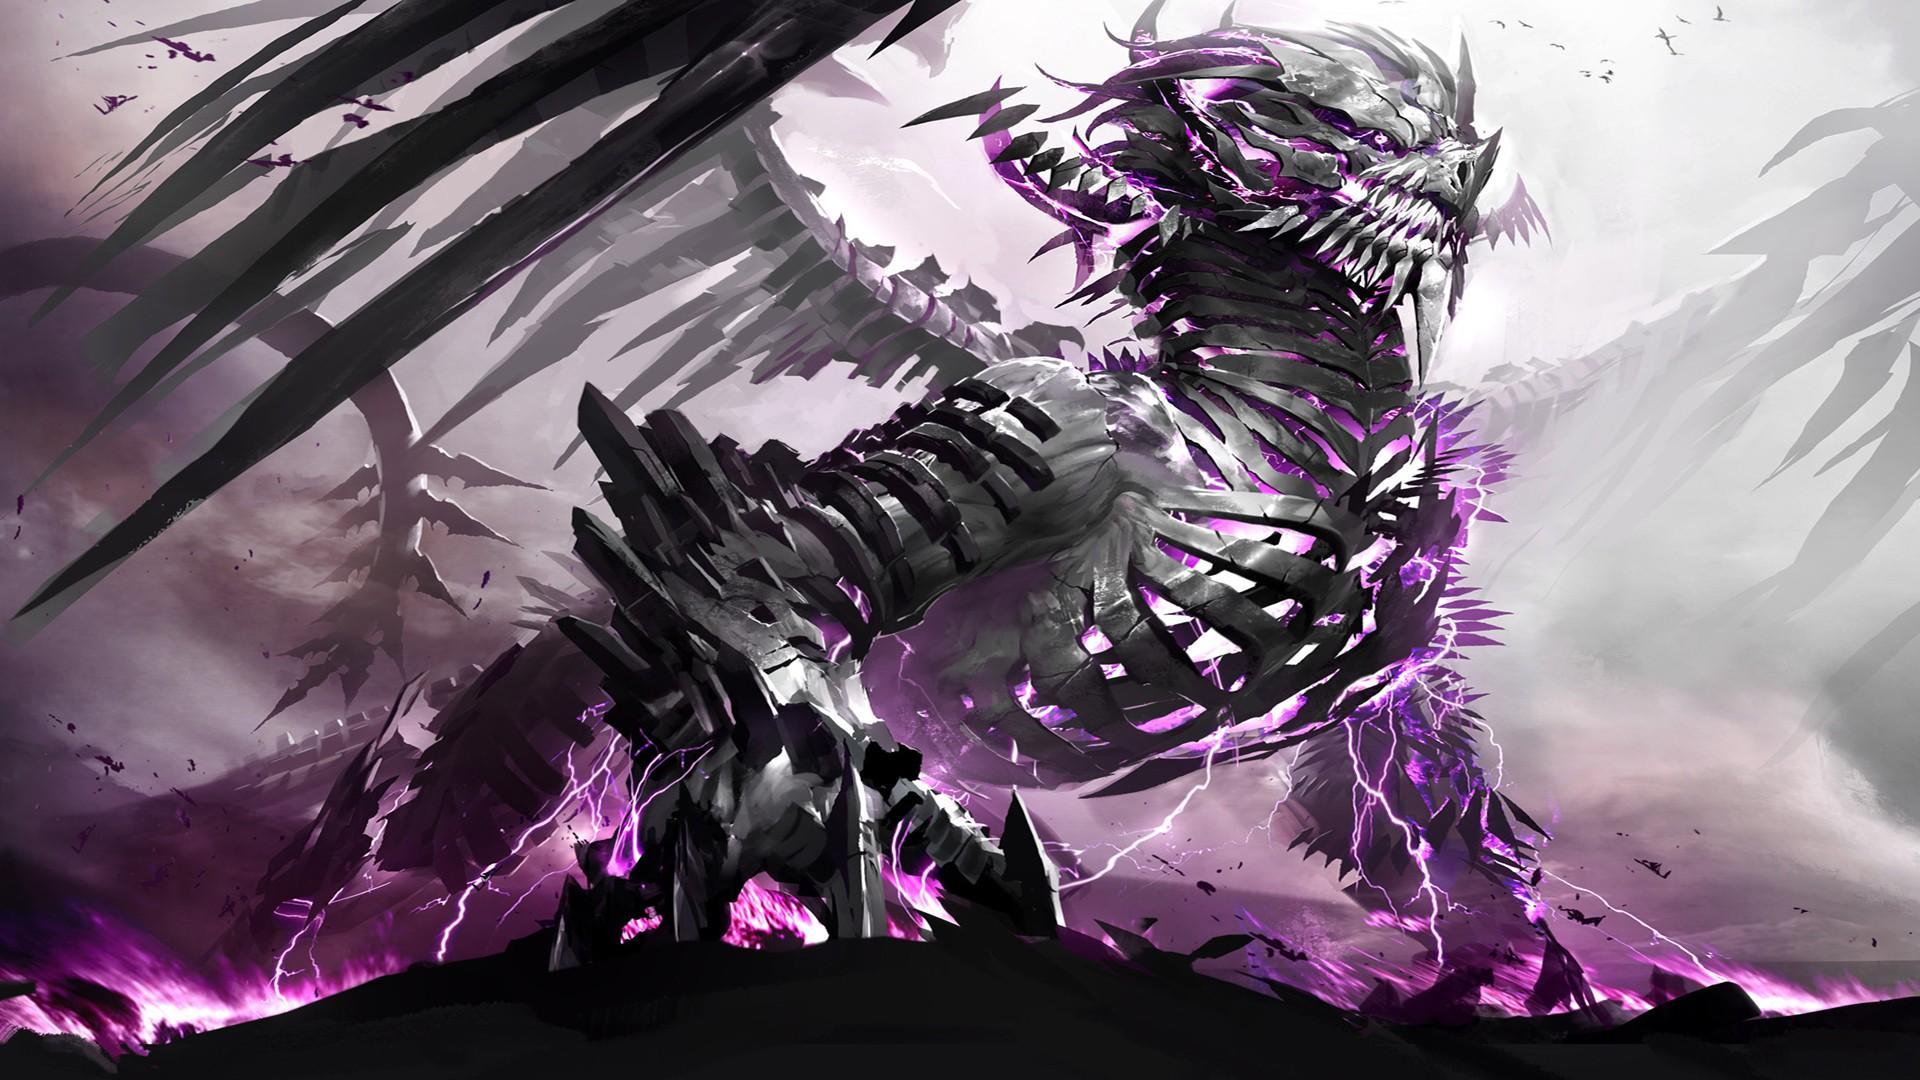 Free Dragon Wallpaper Backgrounds 1920x1080